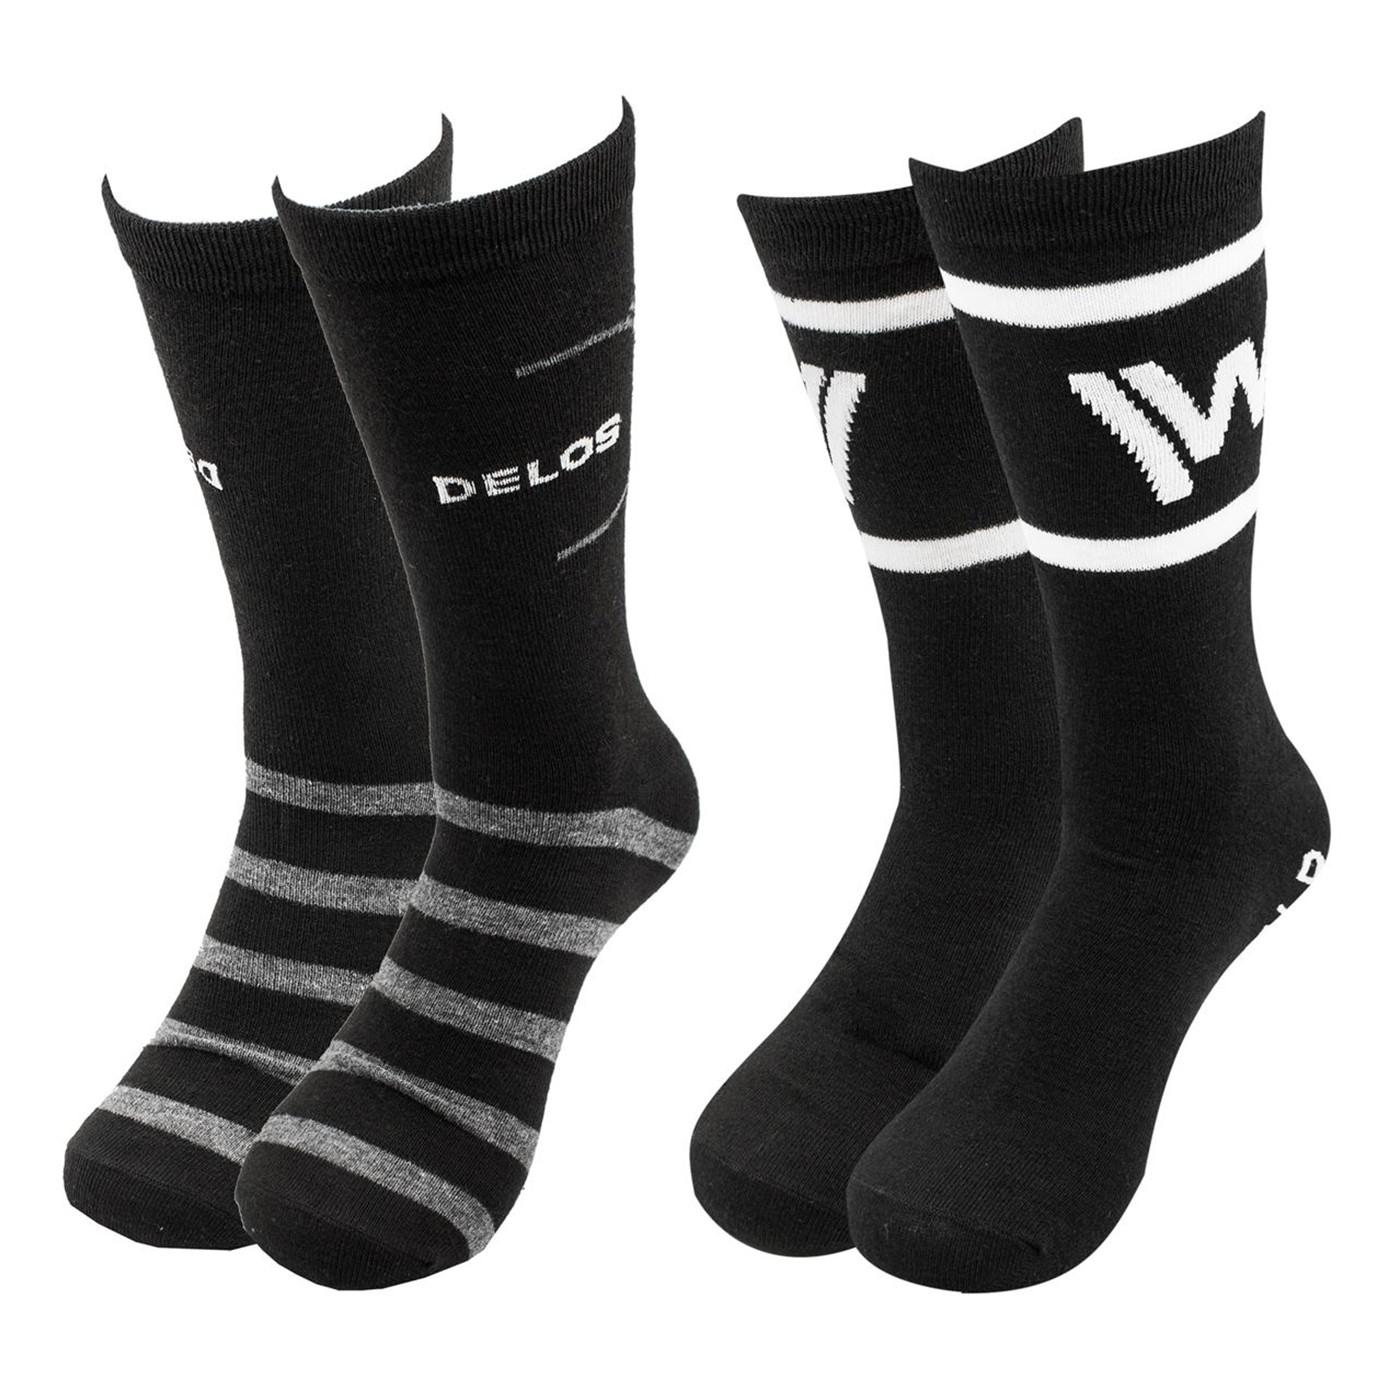 West World 2-pack Crew Socks